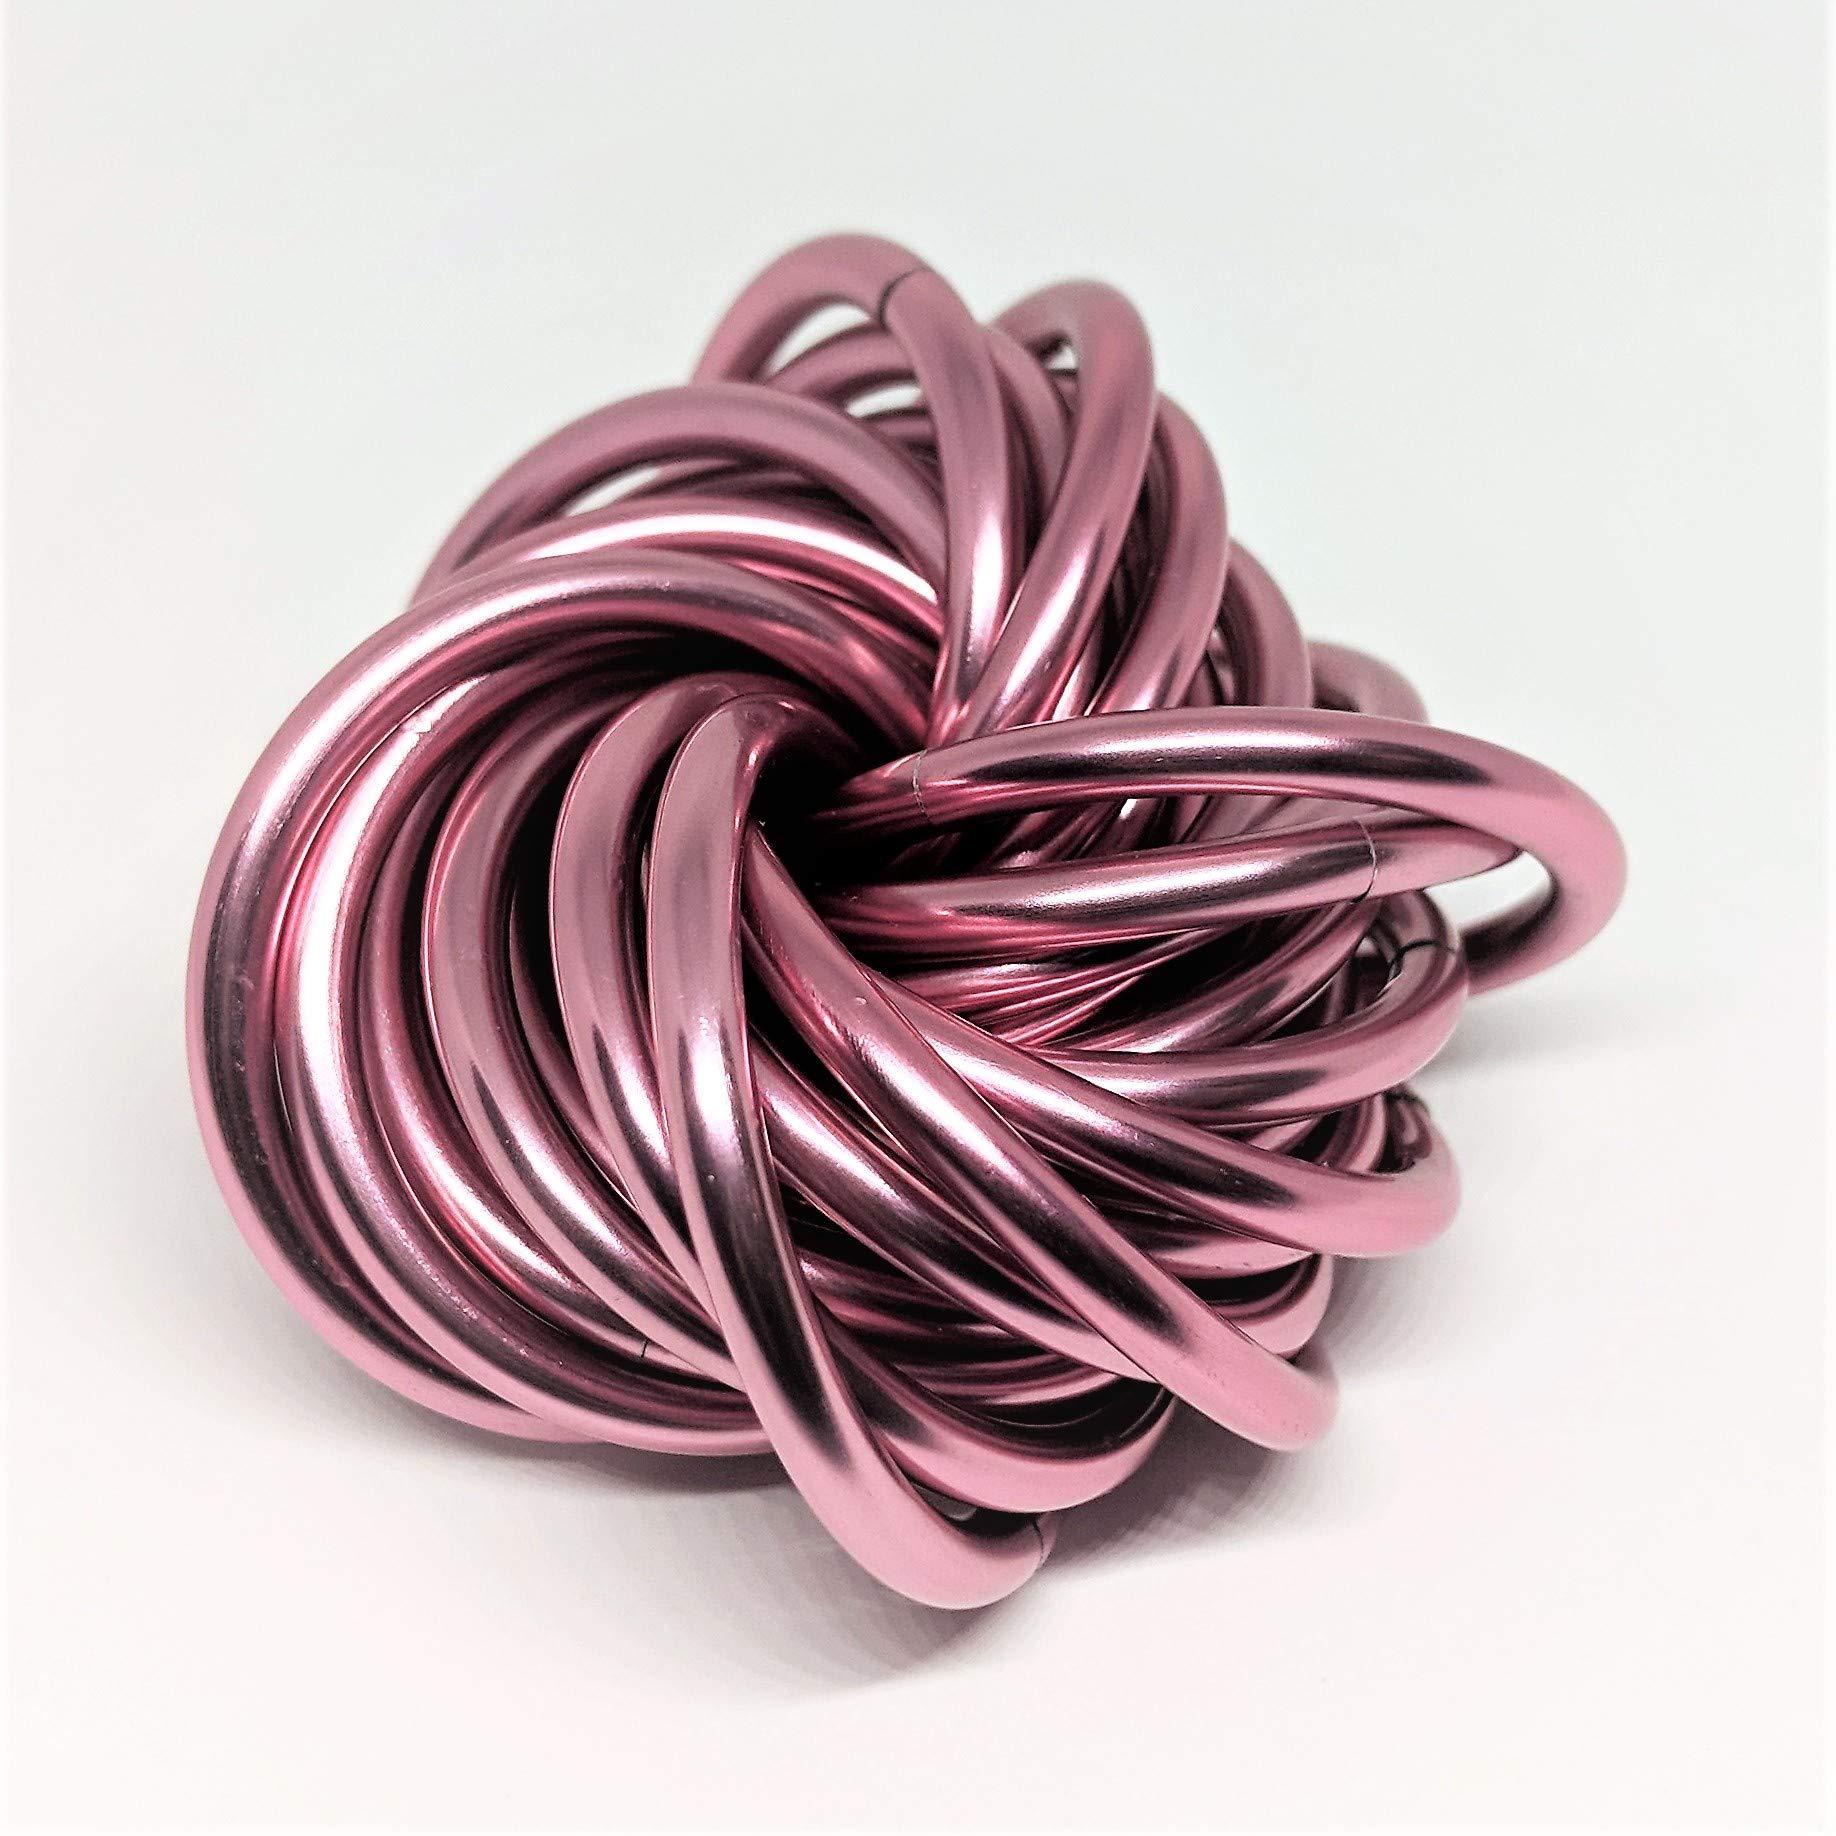 Möbii Daydream: X-Large Mobius Fidget Ball Toy, Stress Ball for Restless Hands (Pink Ice) by Möbii (Image #1)